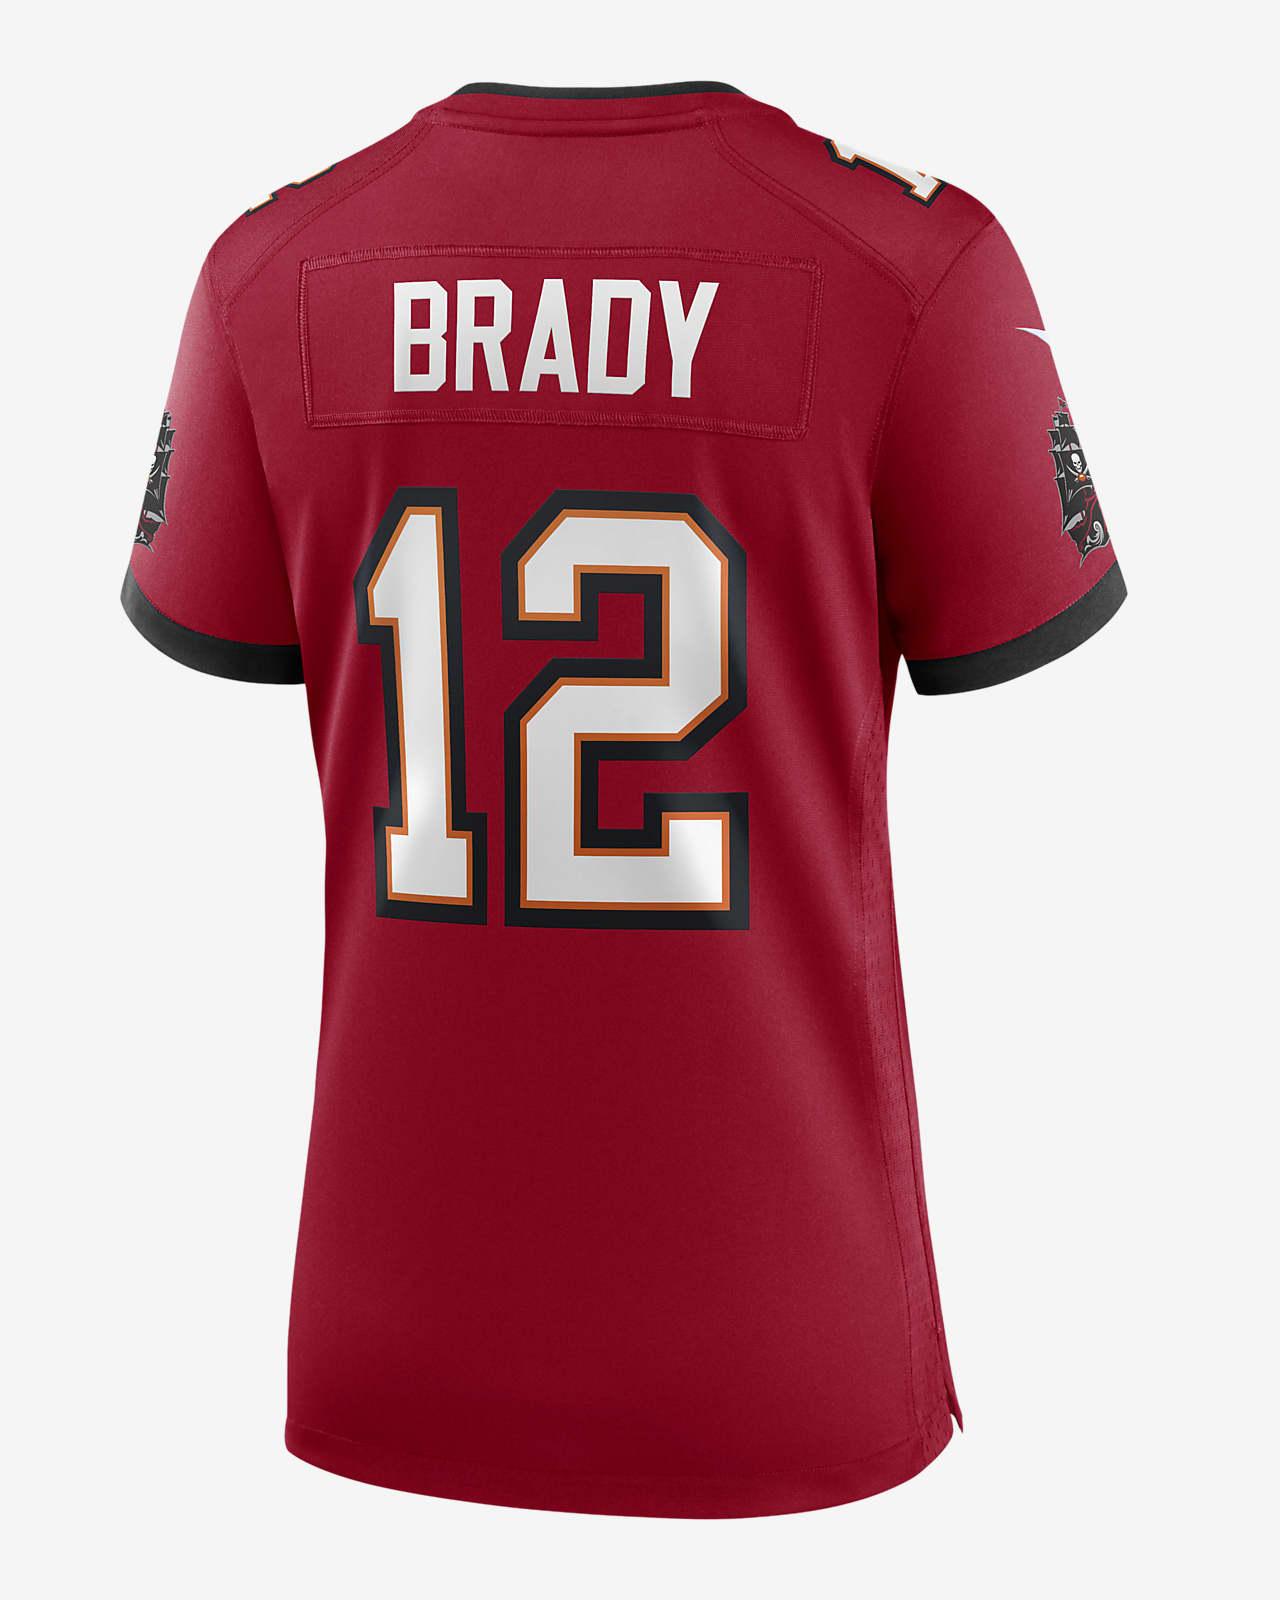 NFL Tampa Bay Buccaneers (Tom Brady) Women's Game Football Jersey